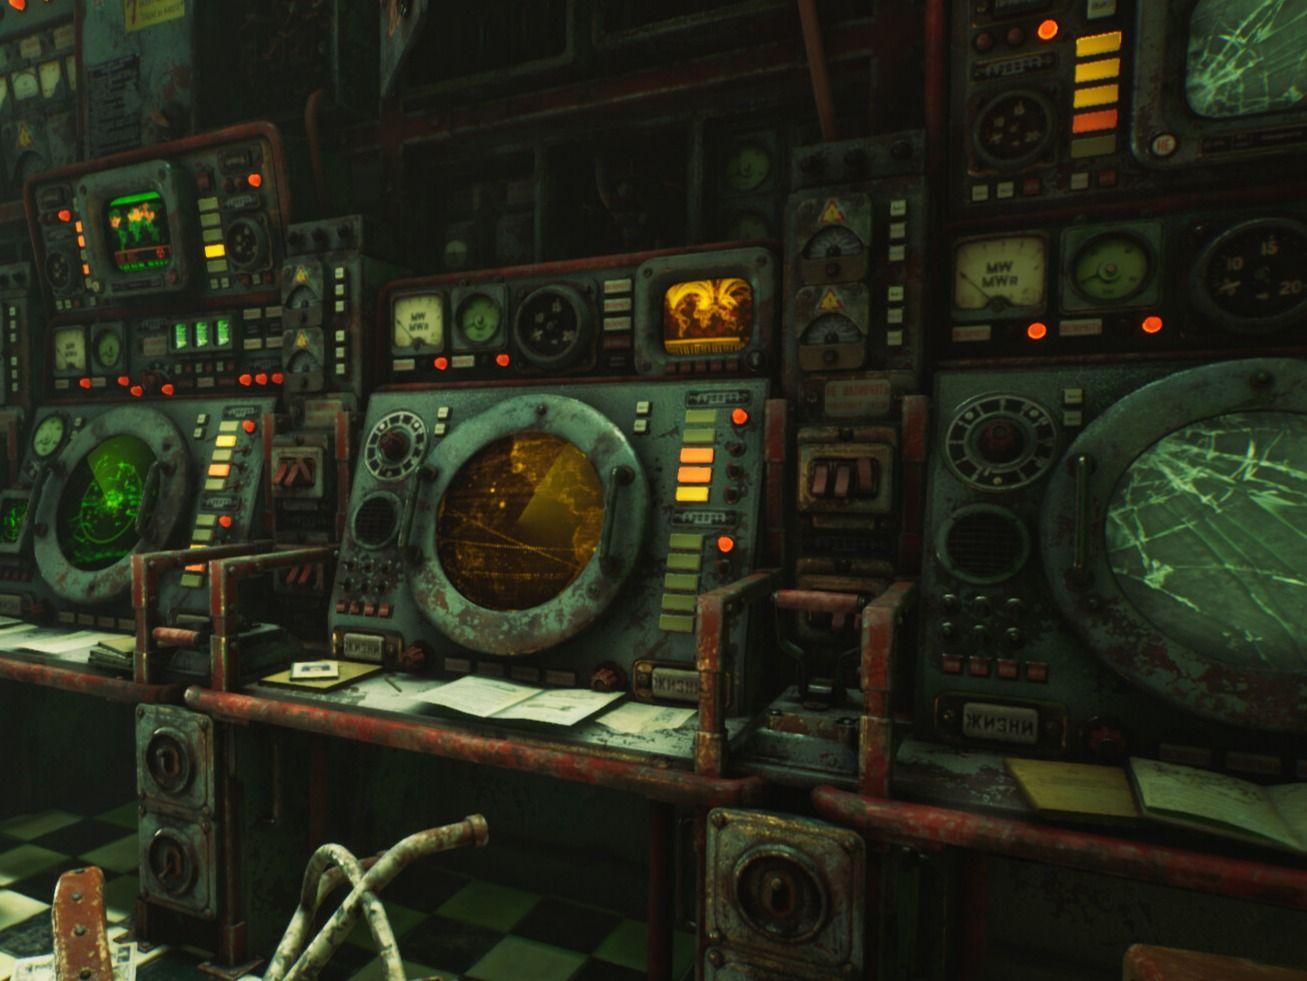 Soviet Nuclear Radar Bunker - UE4 Game Environment Diorama